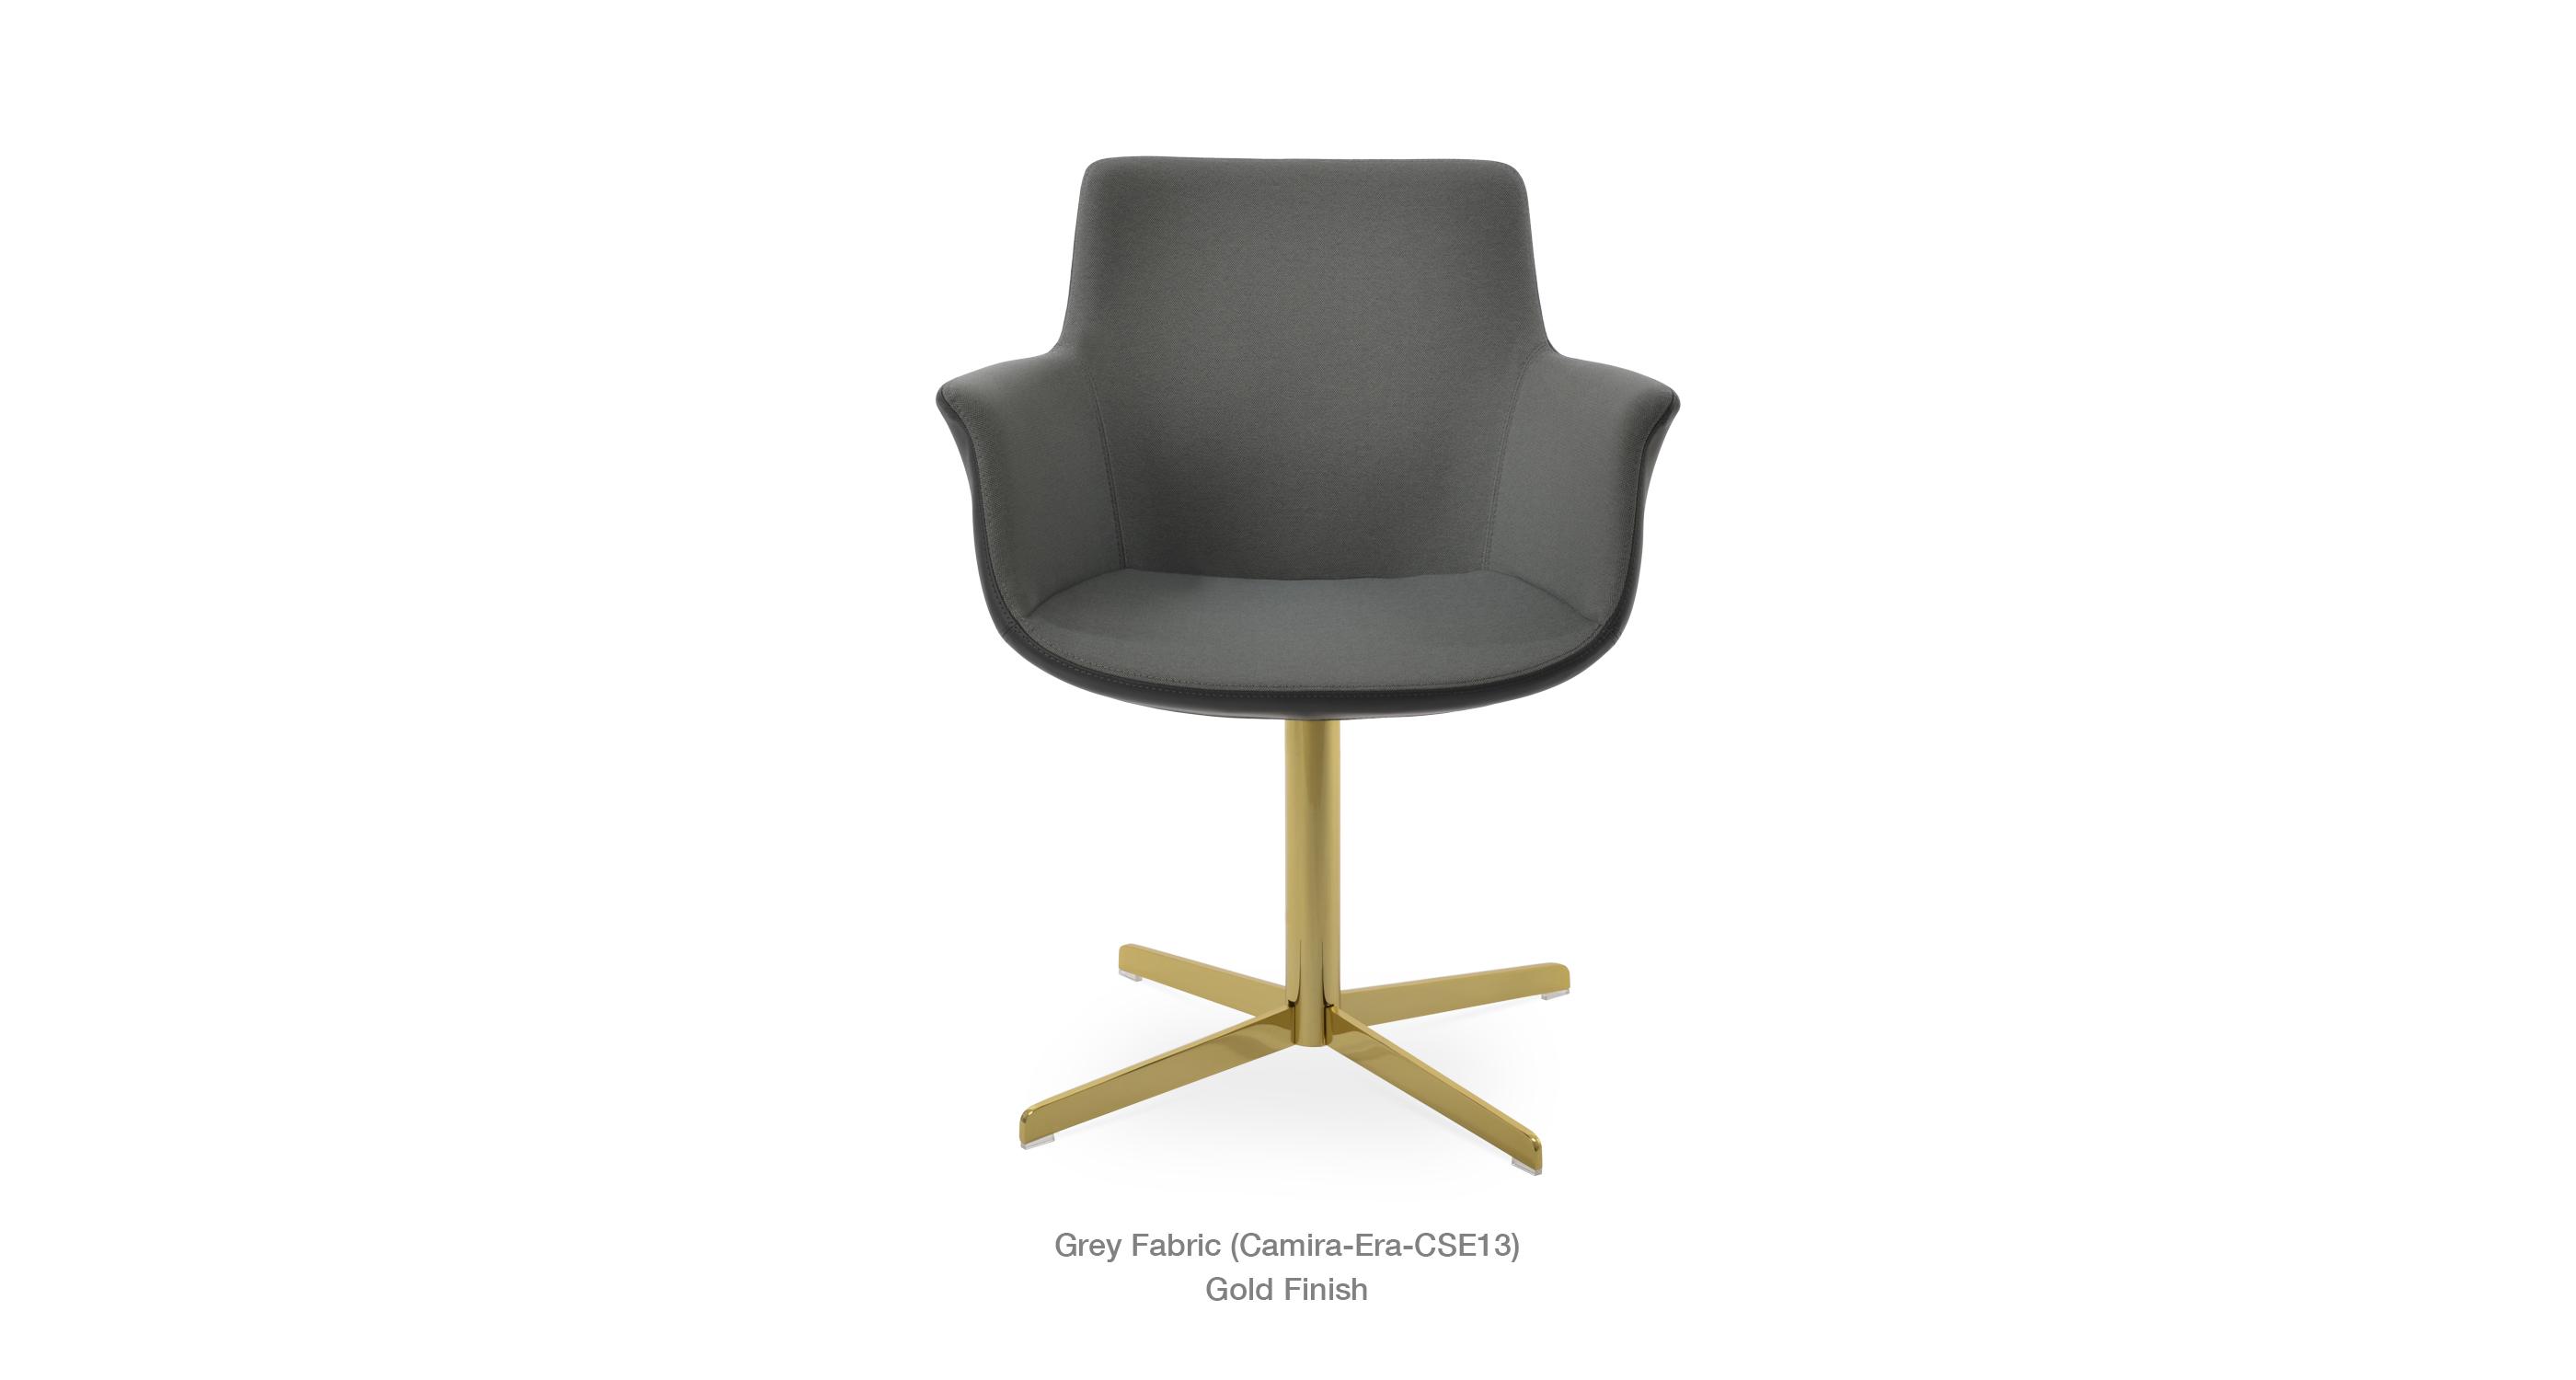 Fine Bottega 4 Star Modern Dining Chair Furniture Sohoconcept Ibusinesslaw Wood Chair Design Ideas Ibusinesslaworg